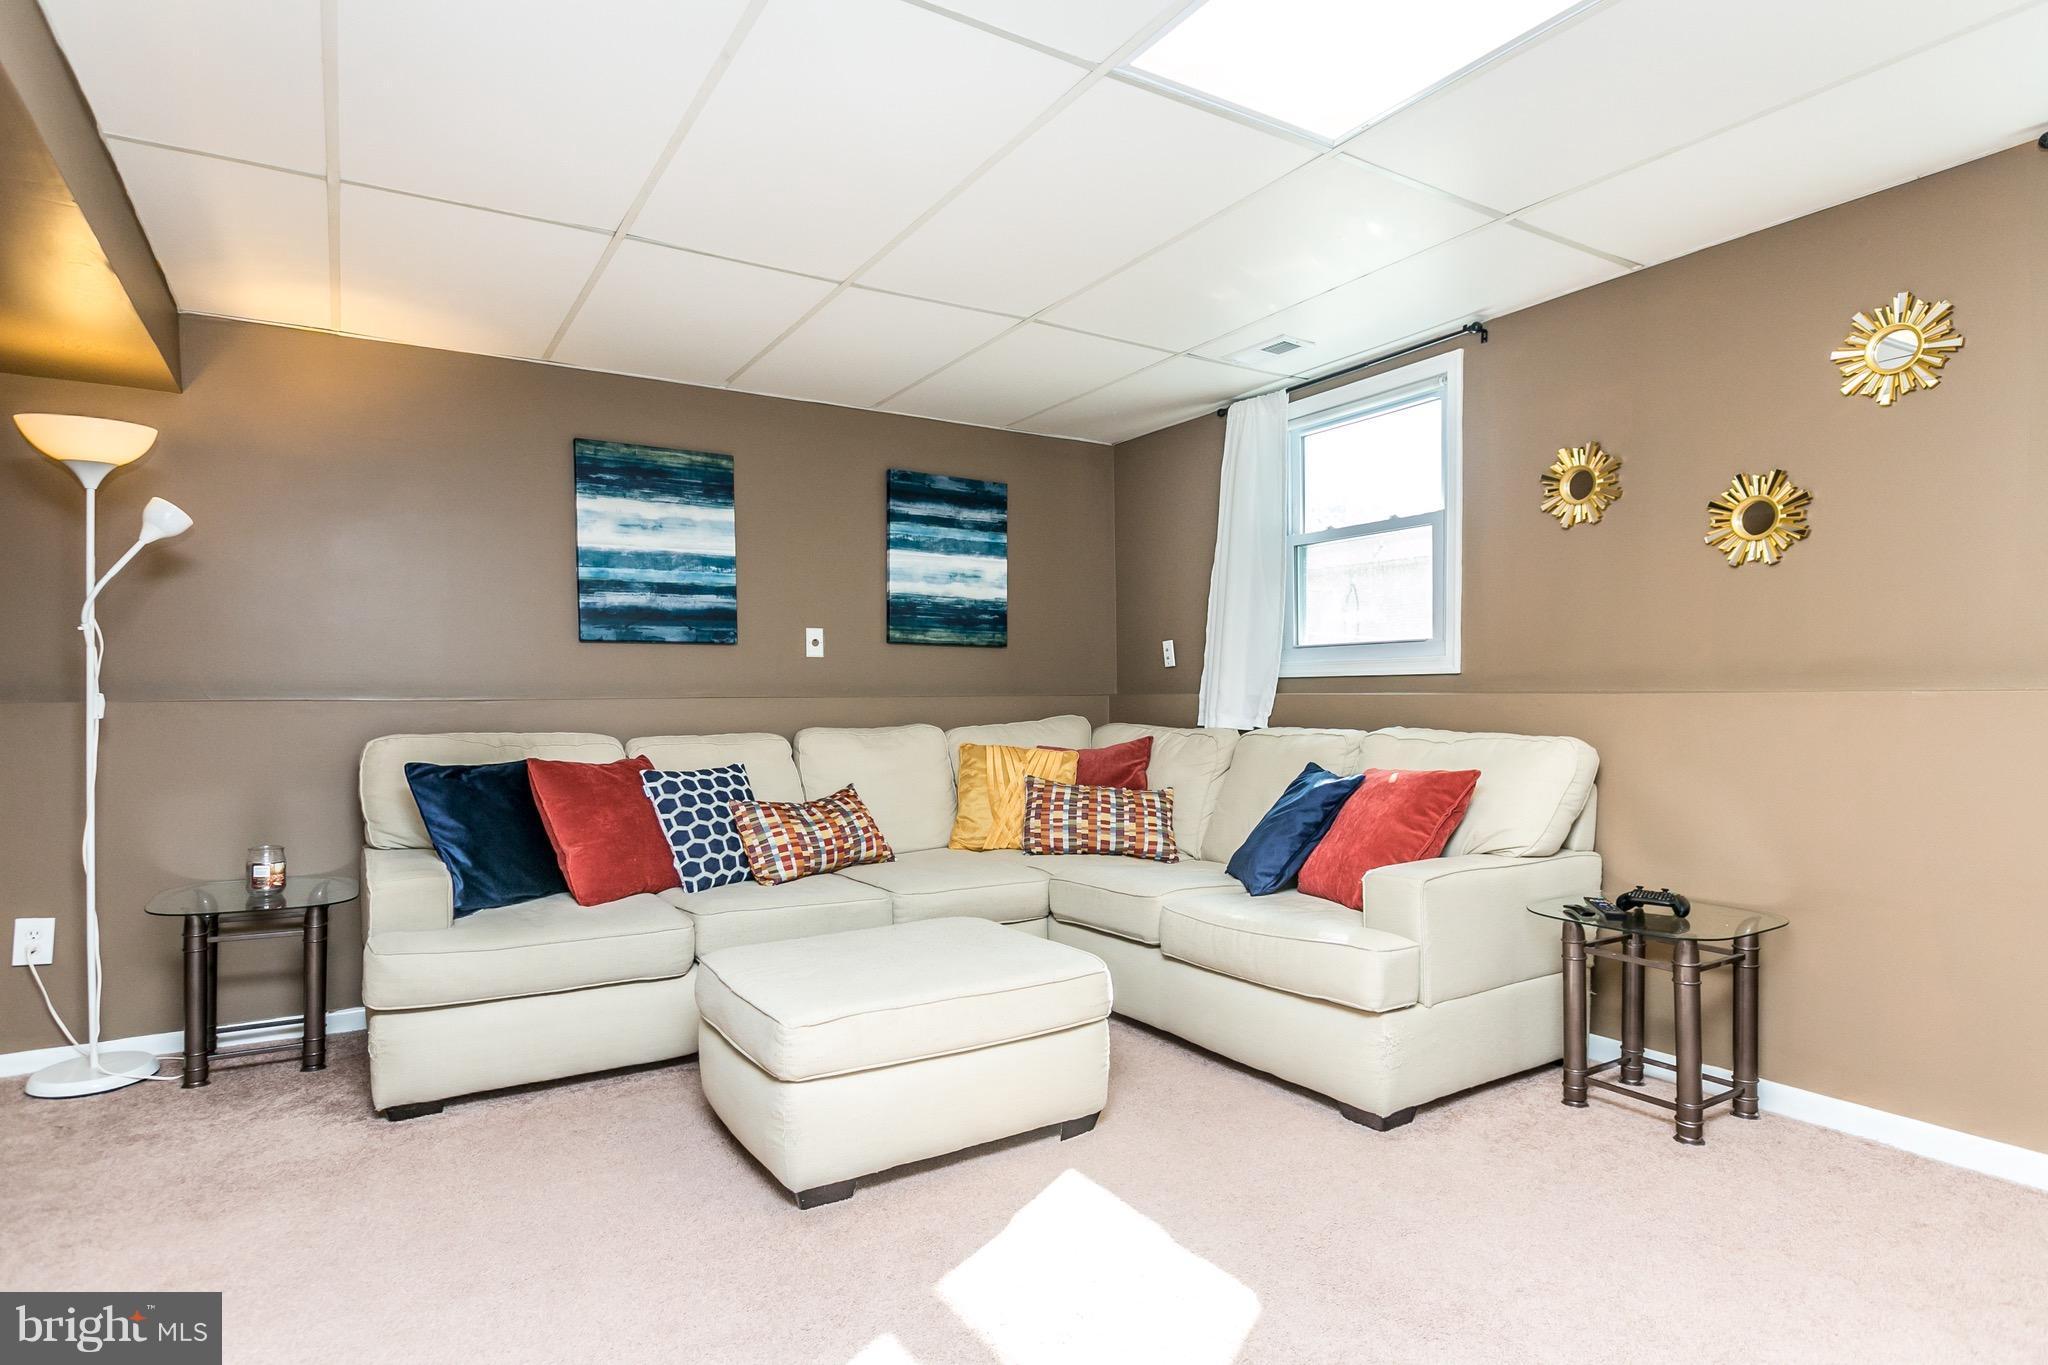 interior design baltimore md interior design living room » Free ...